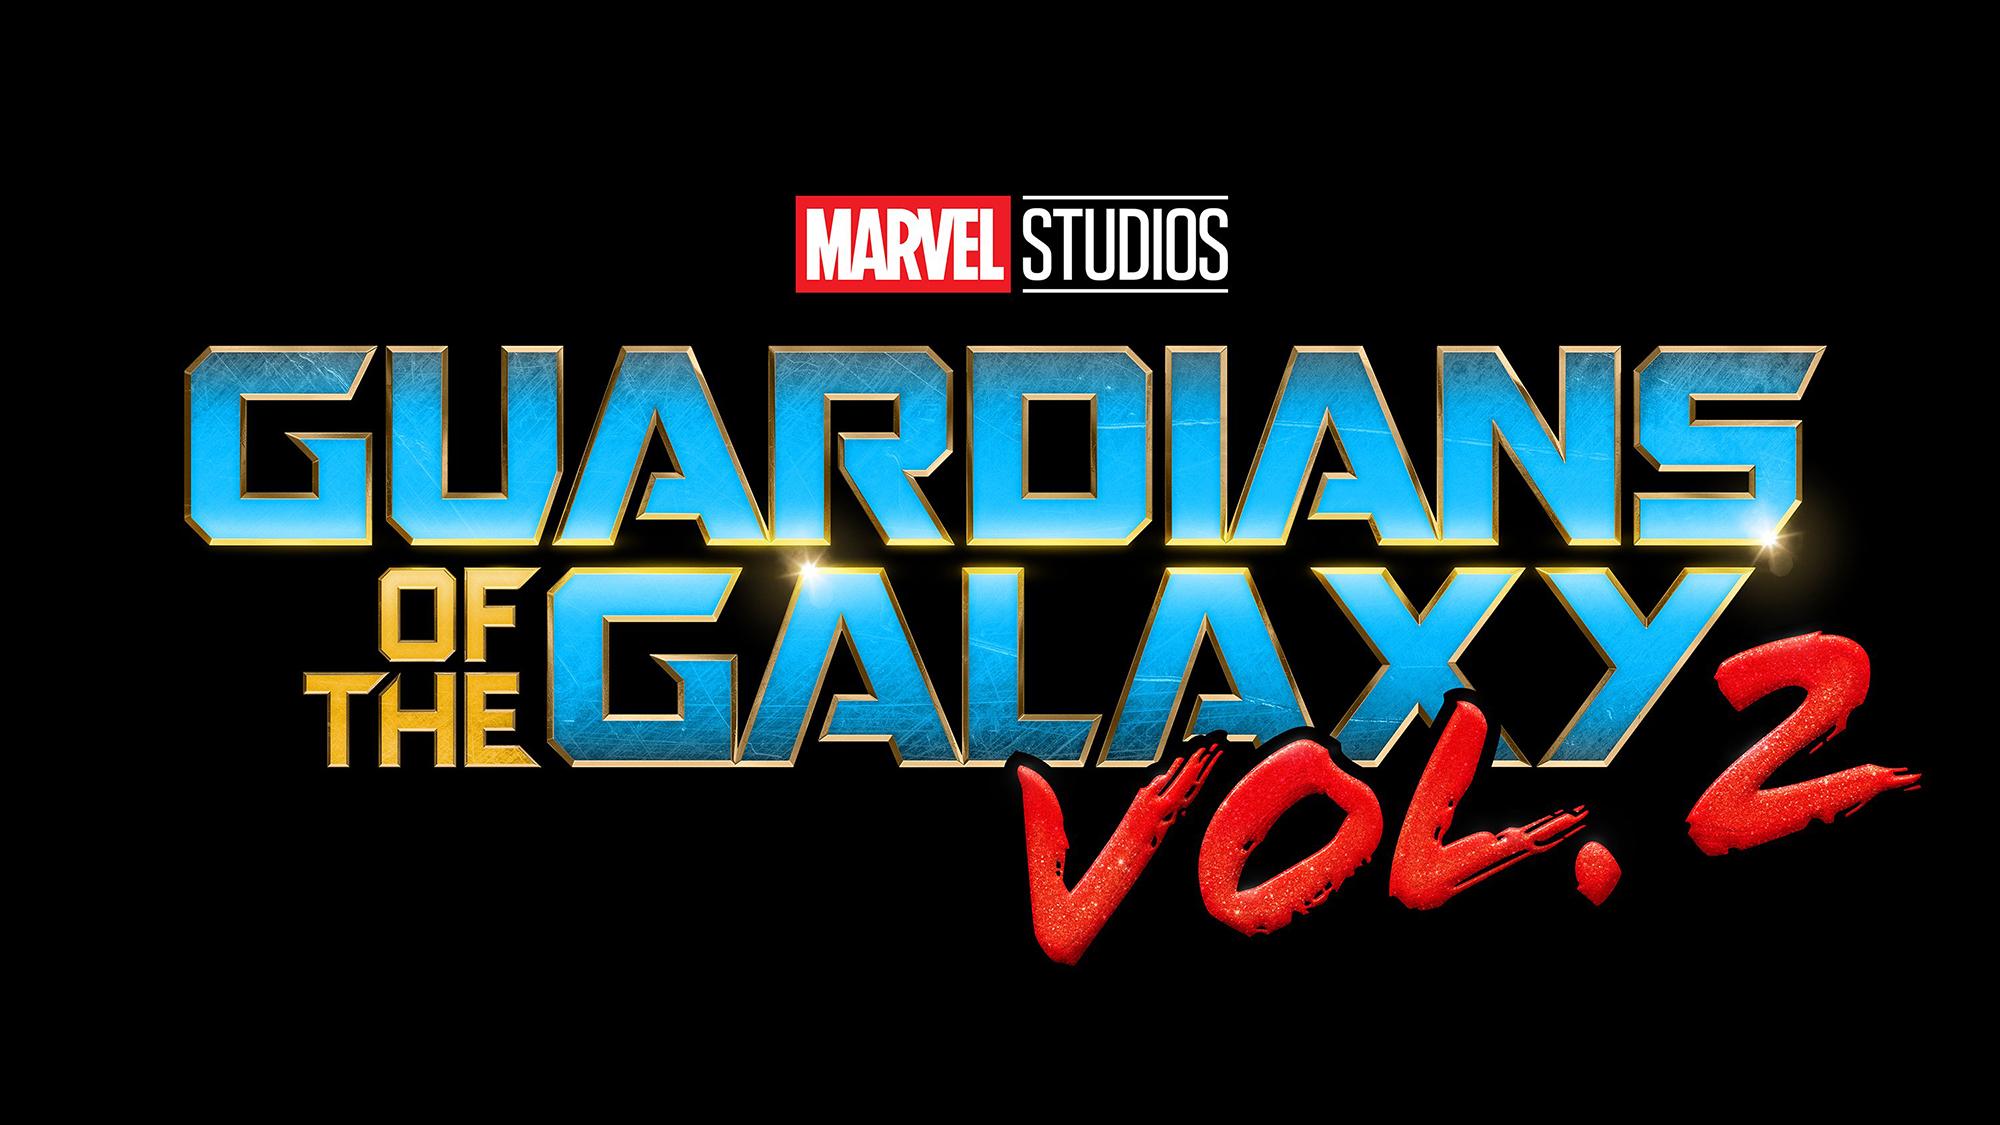 7 key typographic trends in Marvel movie logos | Creative Bloq